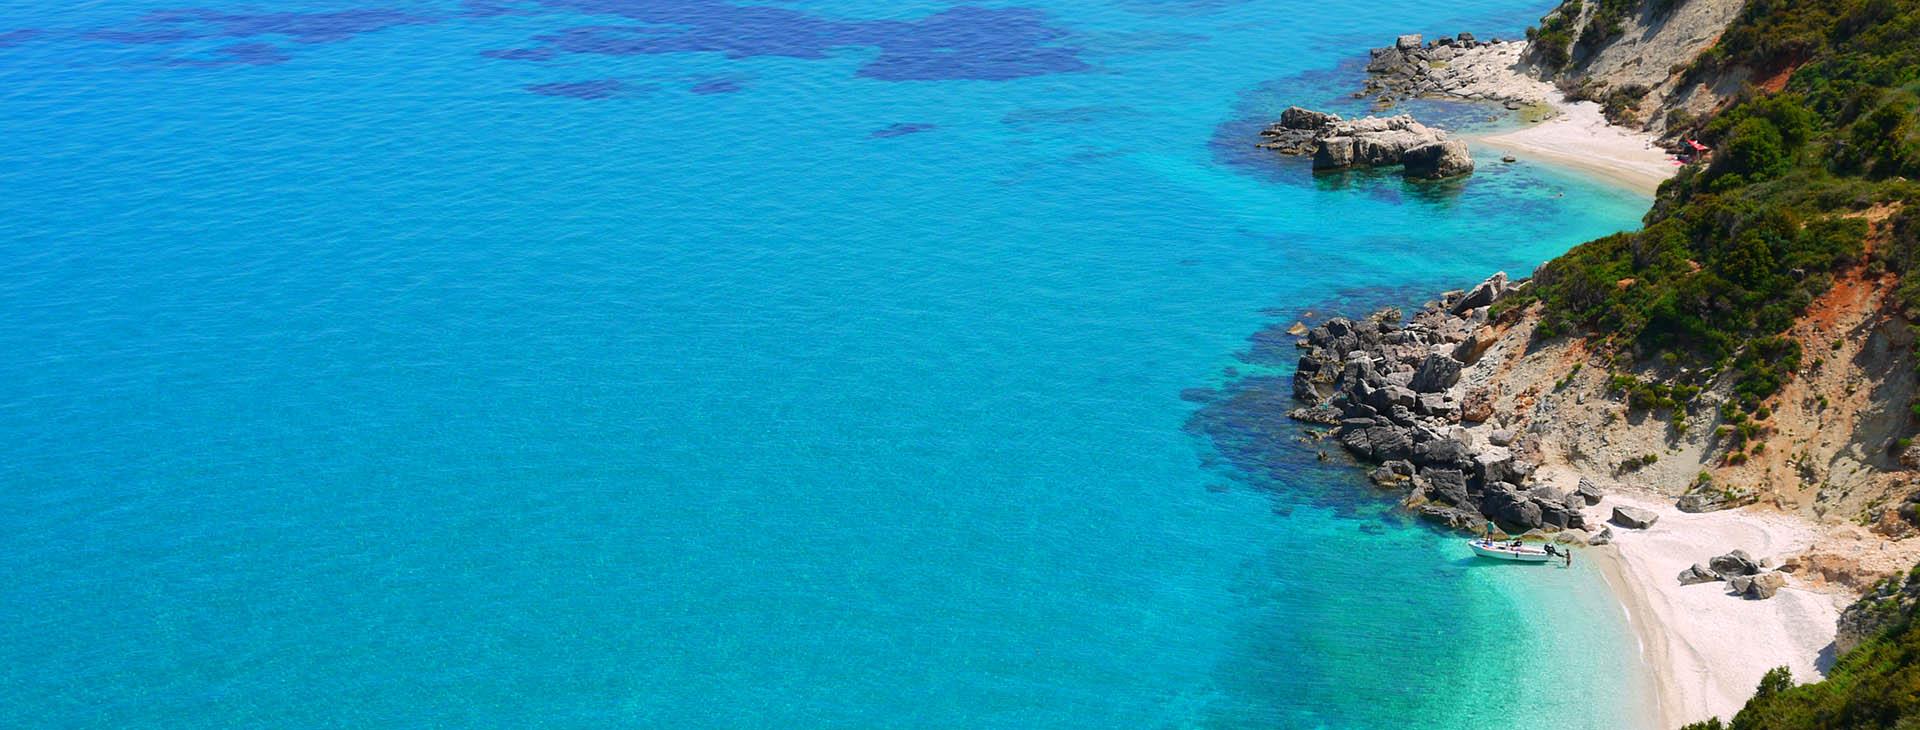 Beach at Zakynthos island